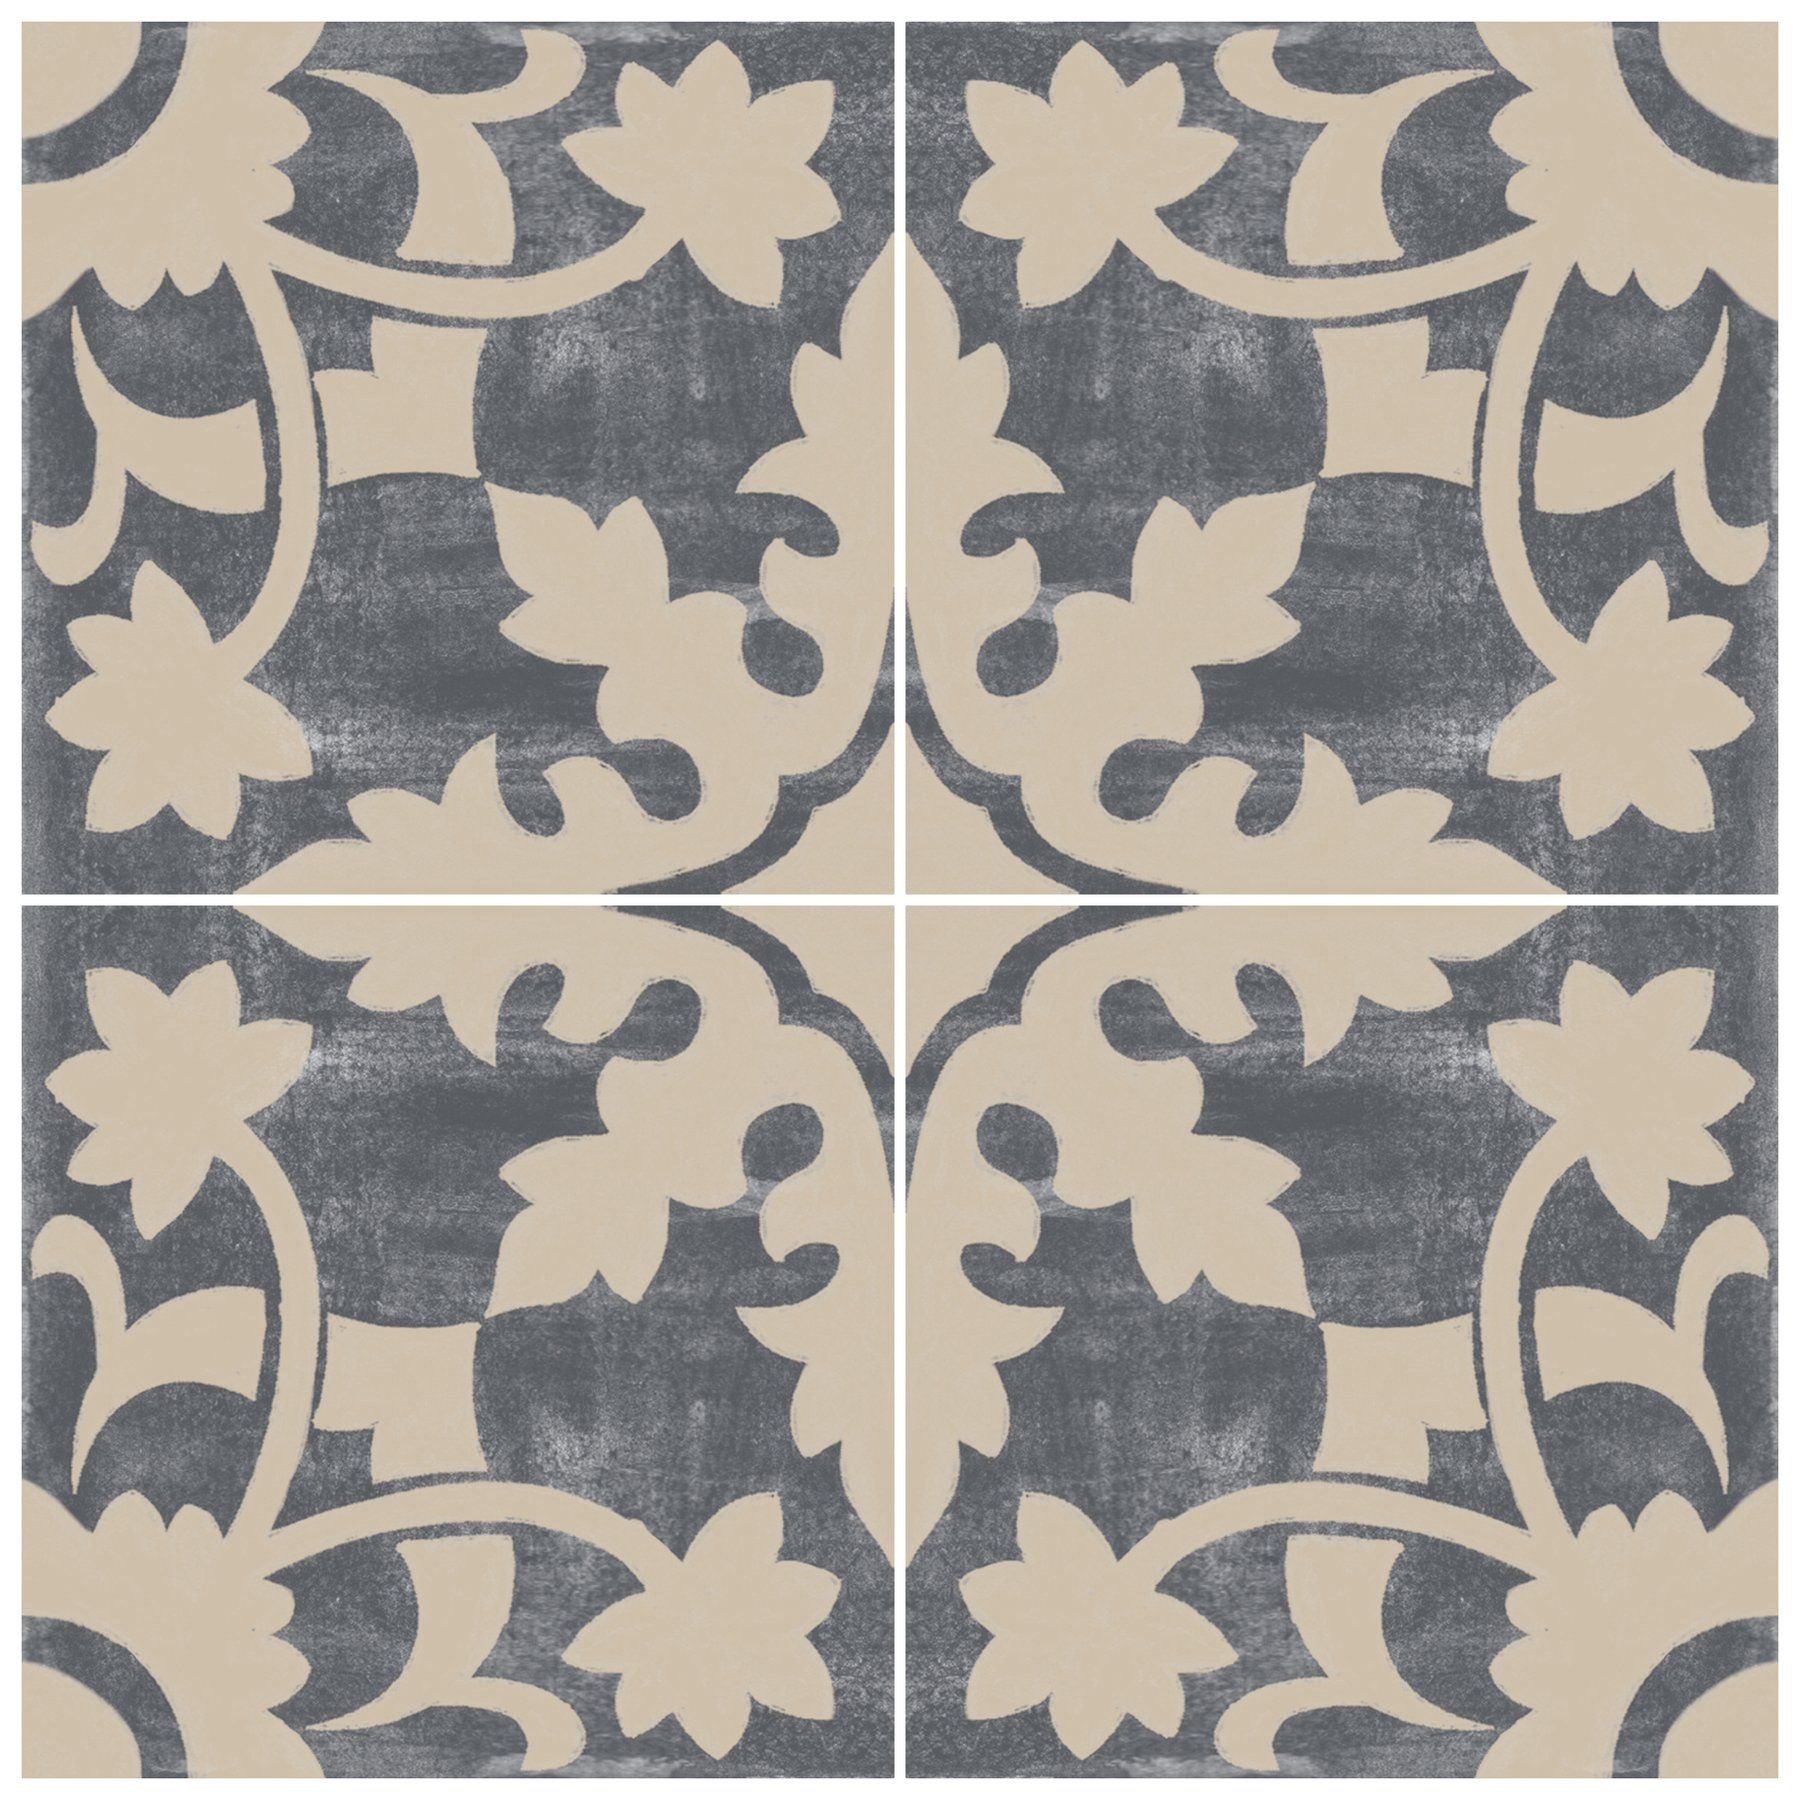 Willow In Fonte Grey Vinyl Tile Sticker In 2020 Vinyl Tile